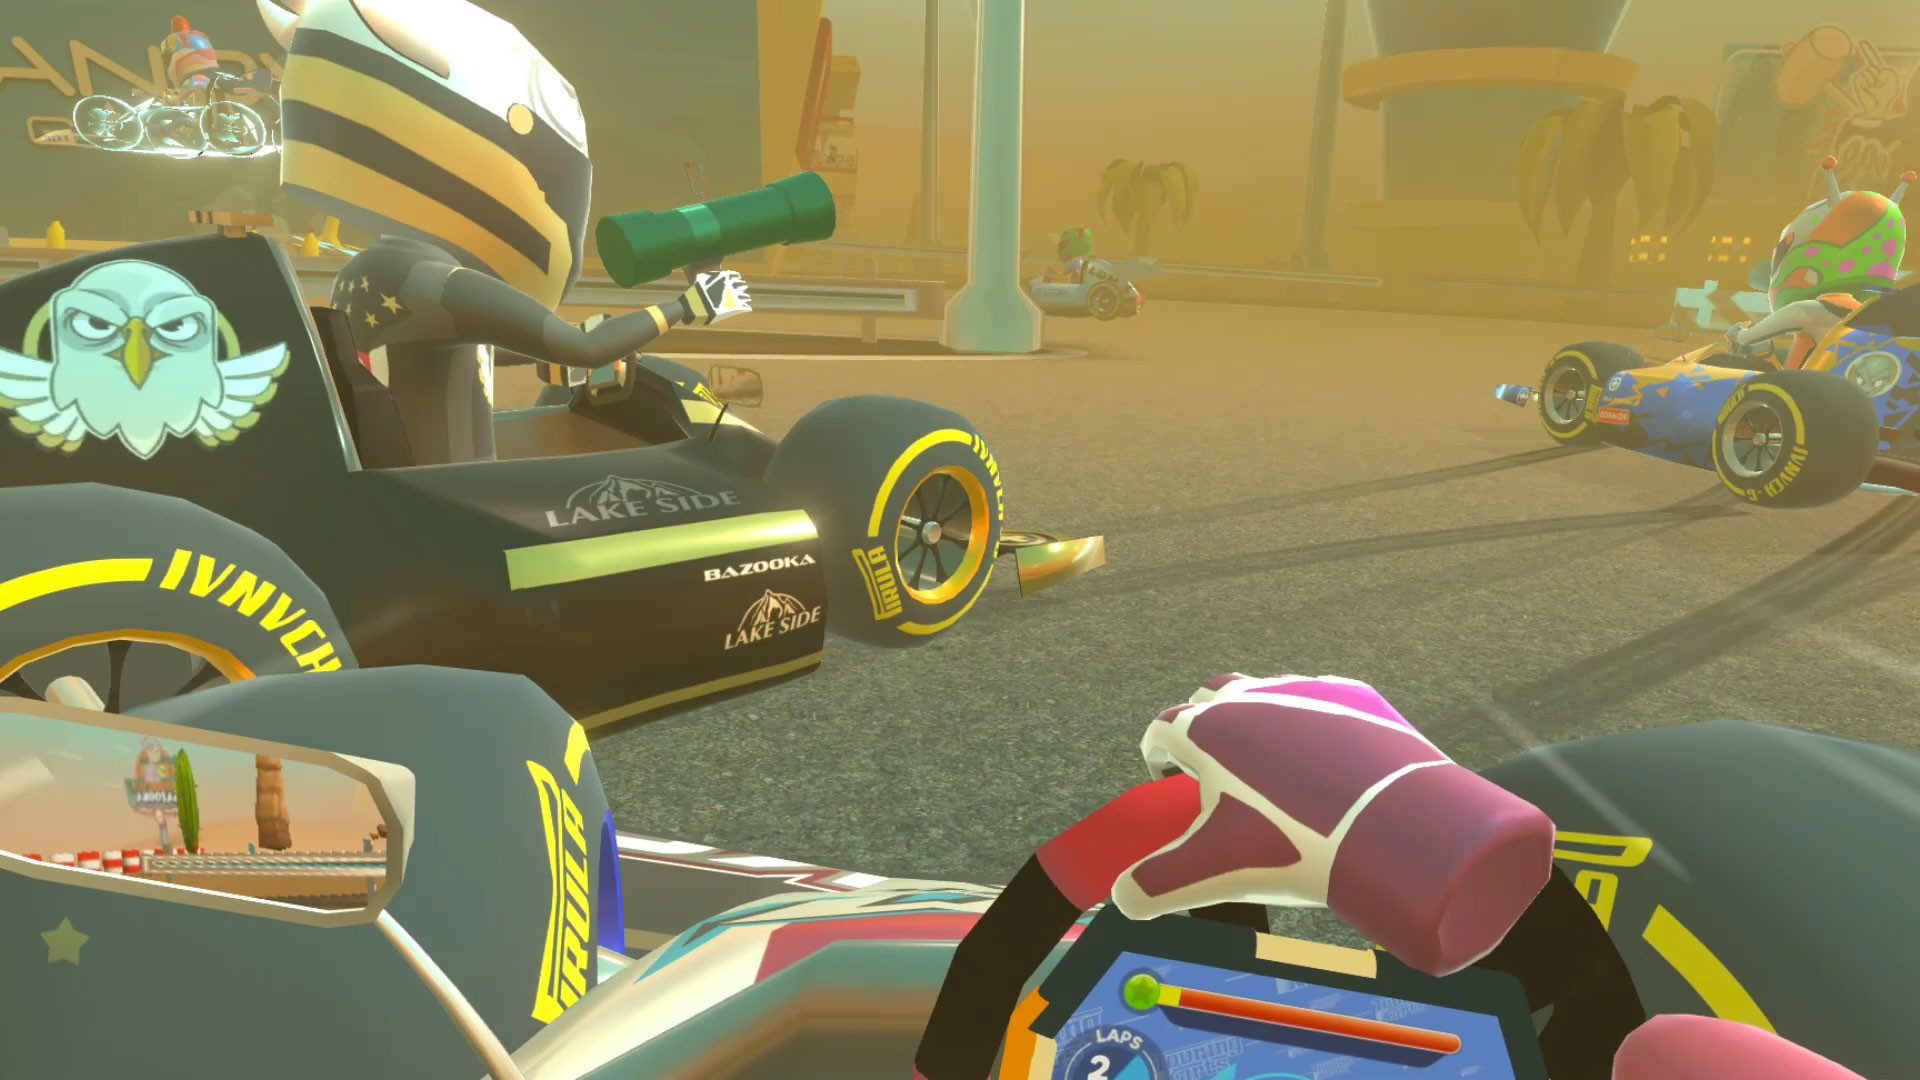 Oculus Quest 游戏《Touring Karts》疯狂卡丁车插图